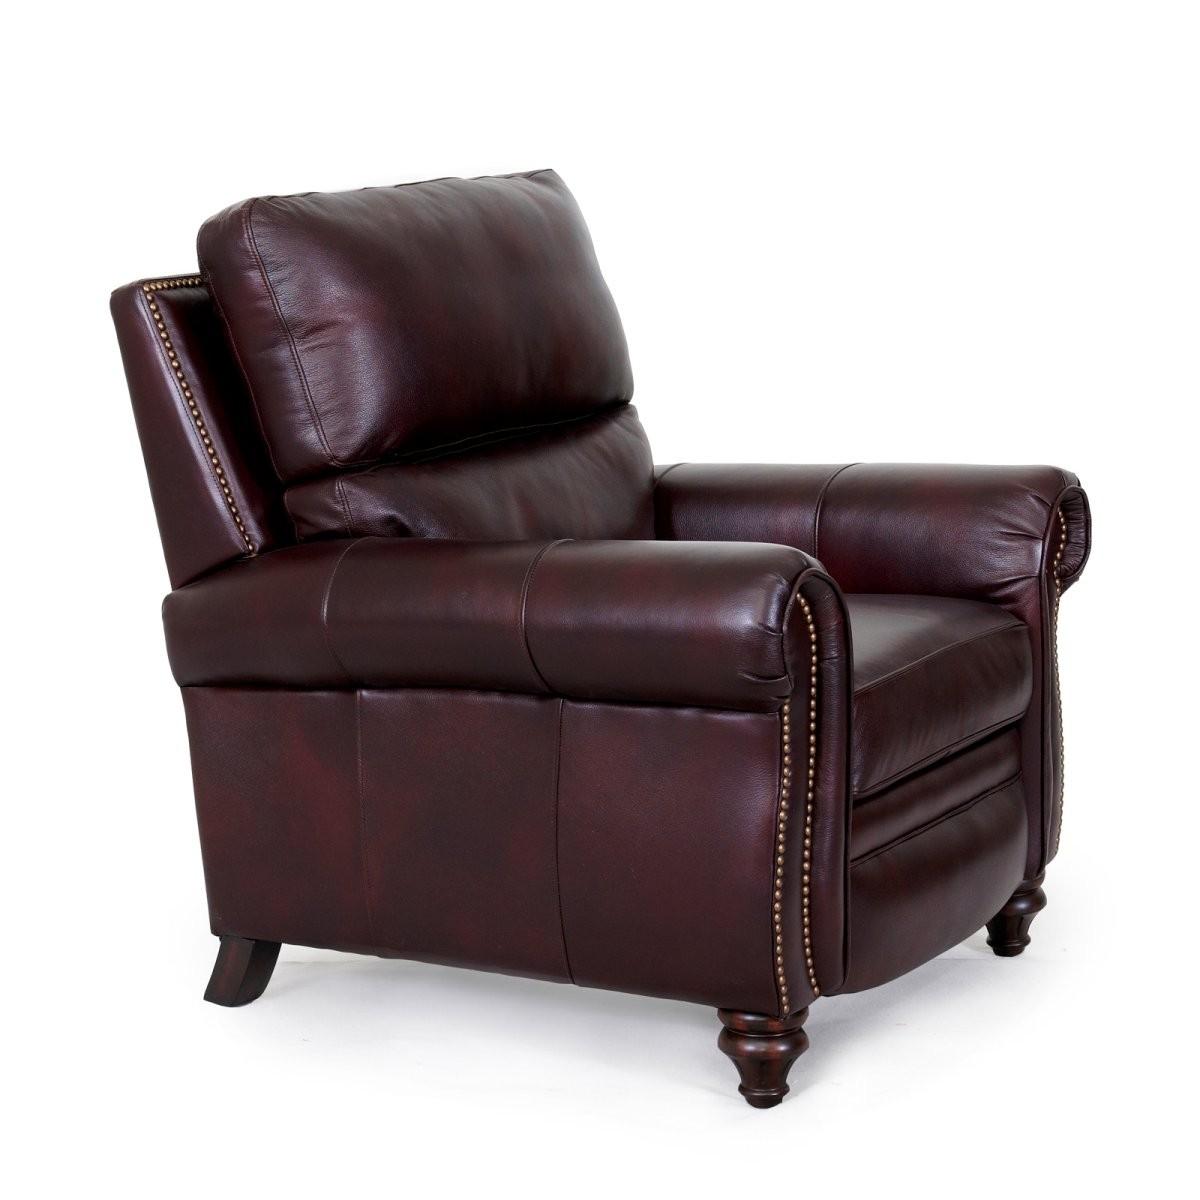 Leather Recliner Sofa Manchester: Barcalounger Dalton II Recliner